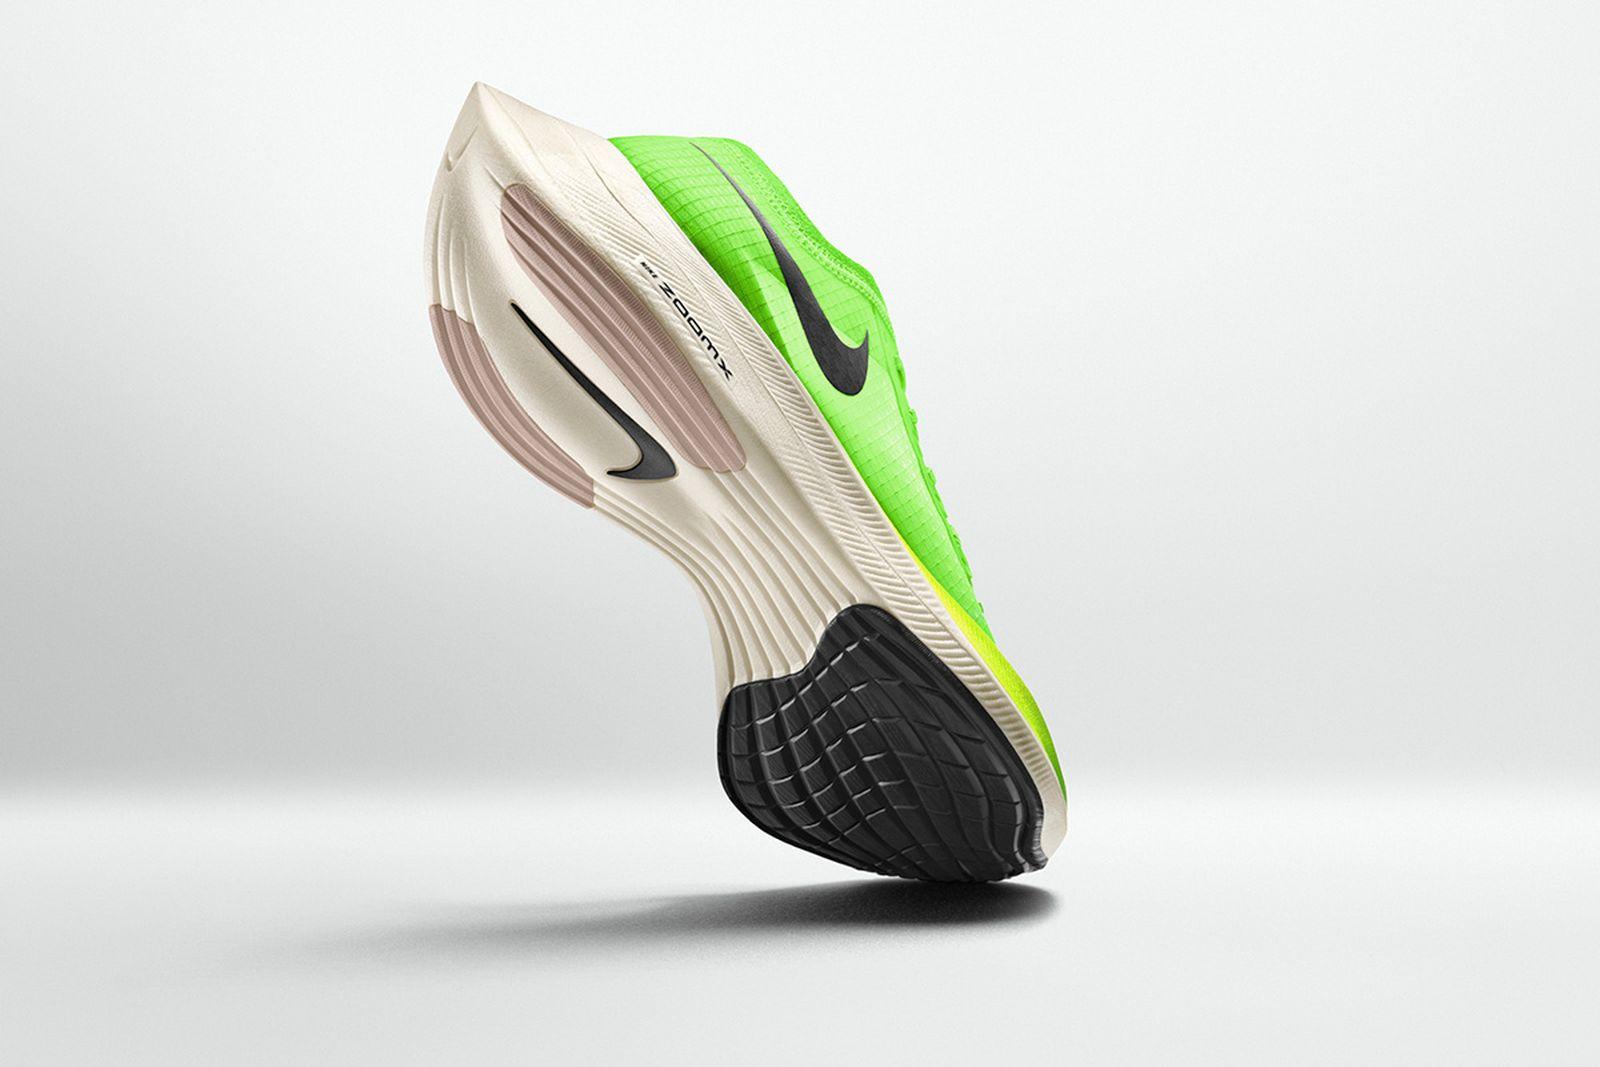 nike vaporfly next percent release date price Adidas Hoka One One New Balance